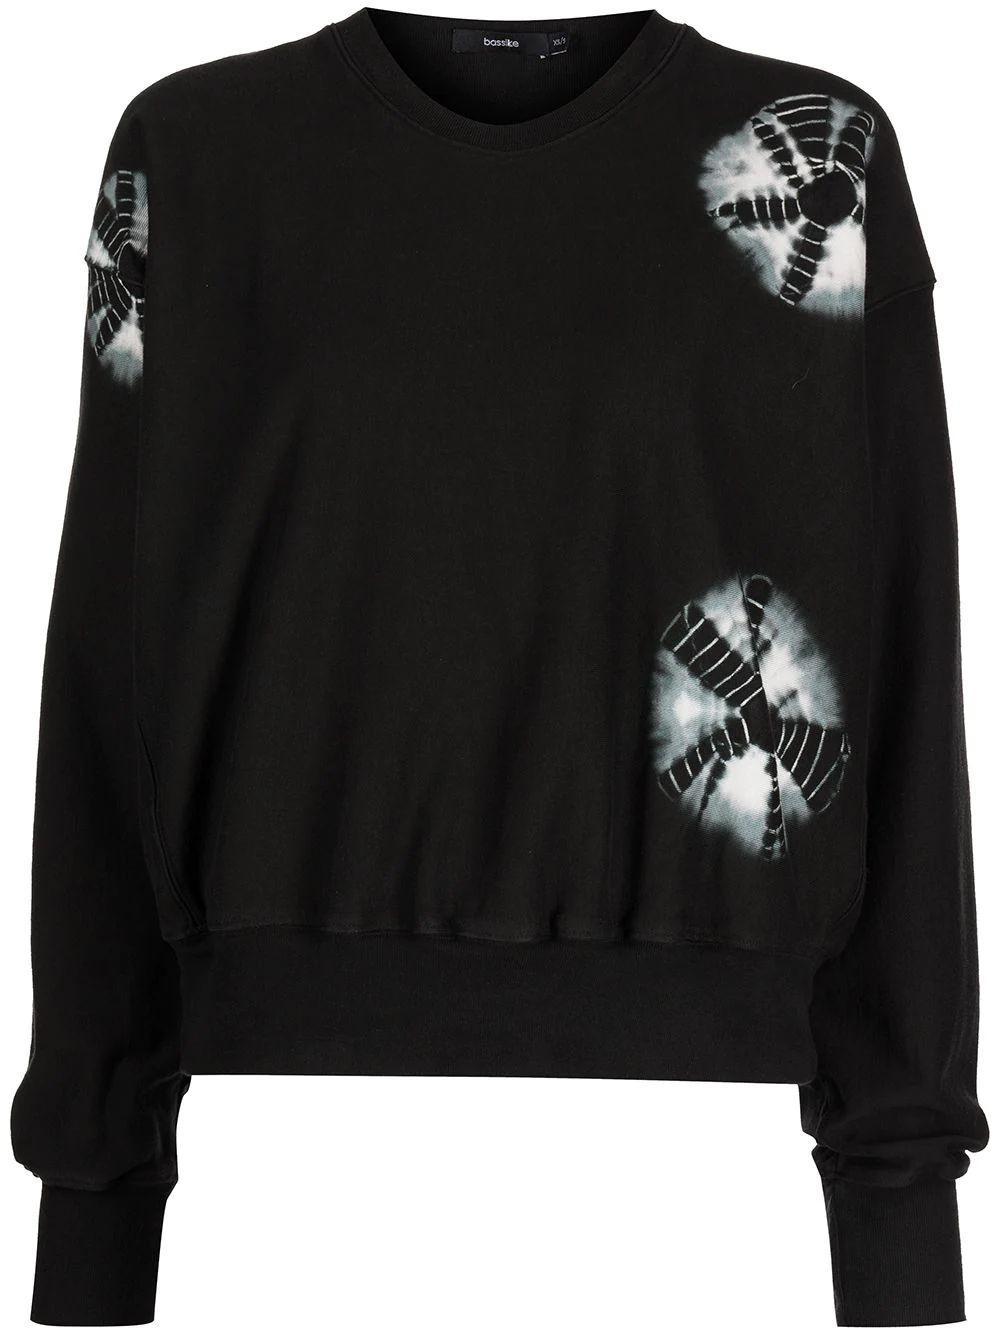 Karamatsu Sweatshirt Item # PC21WFT101